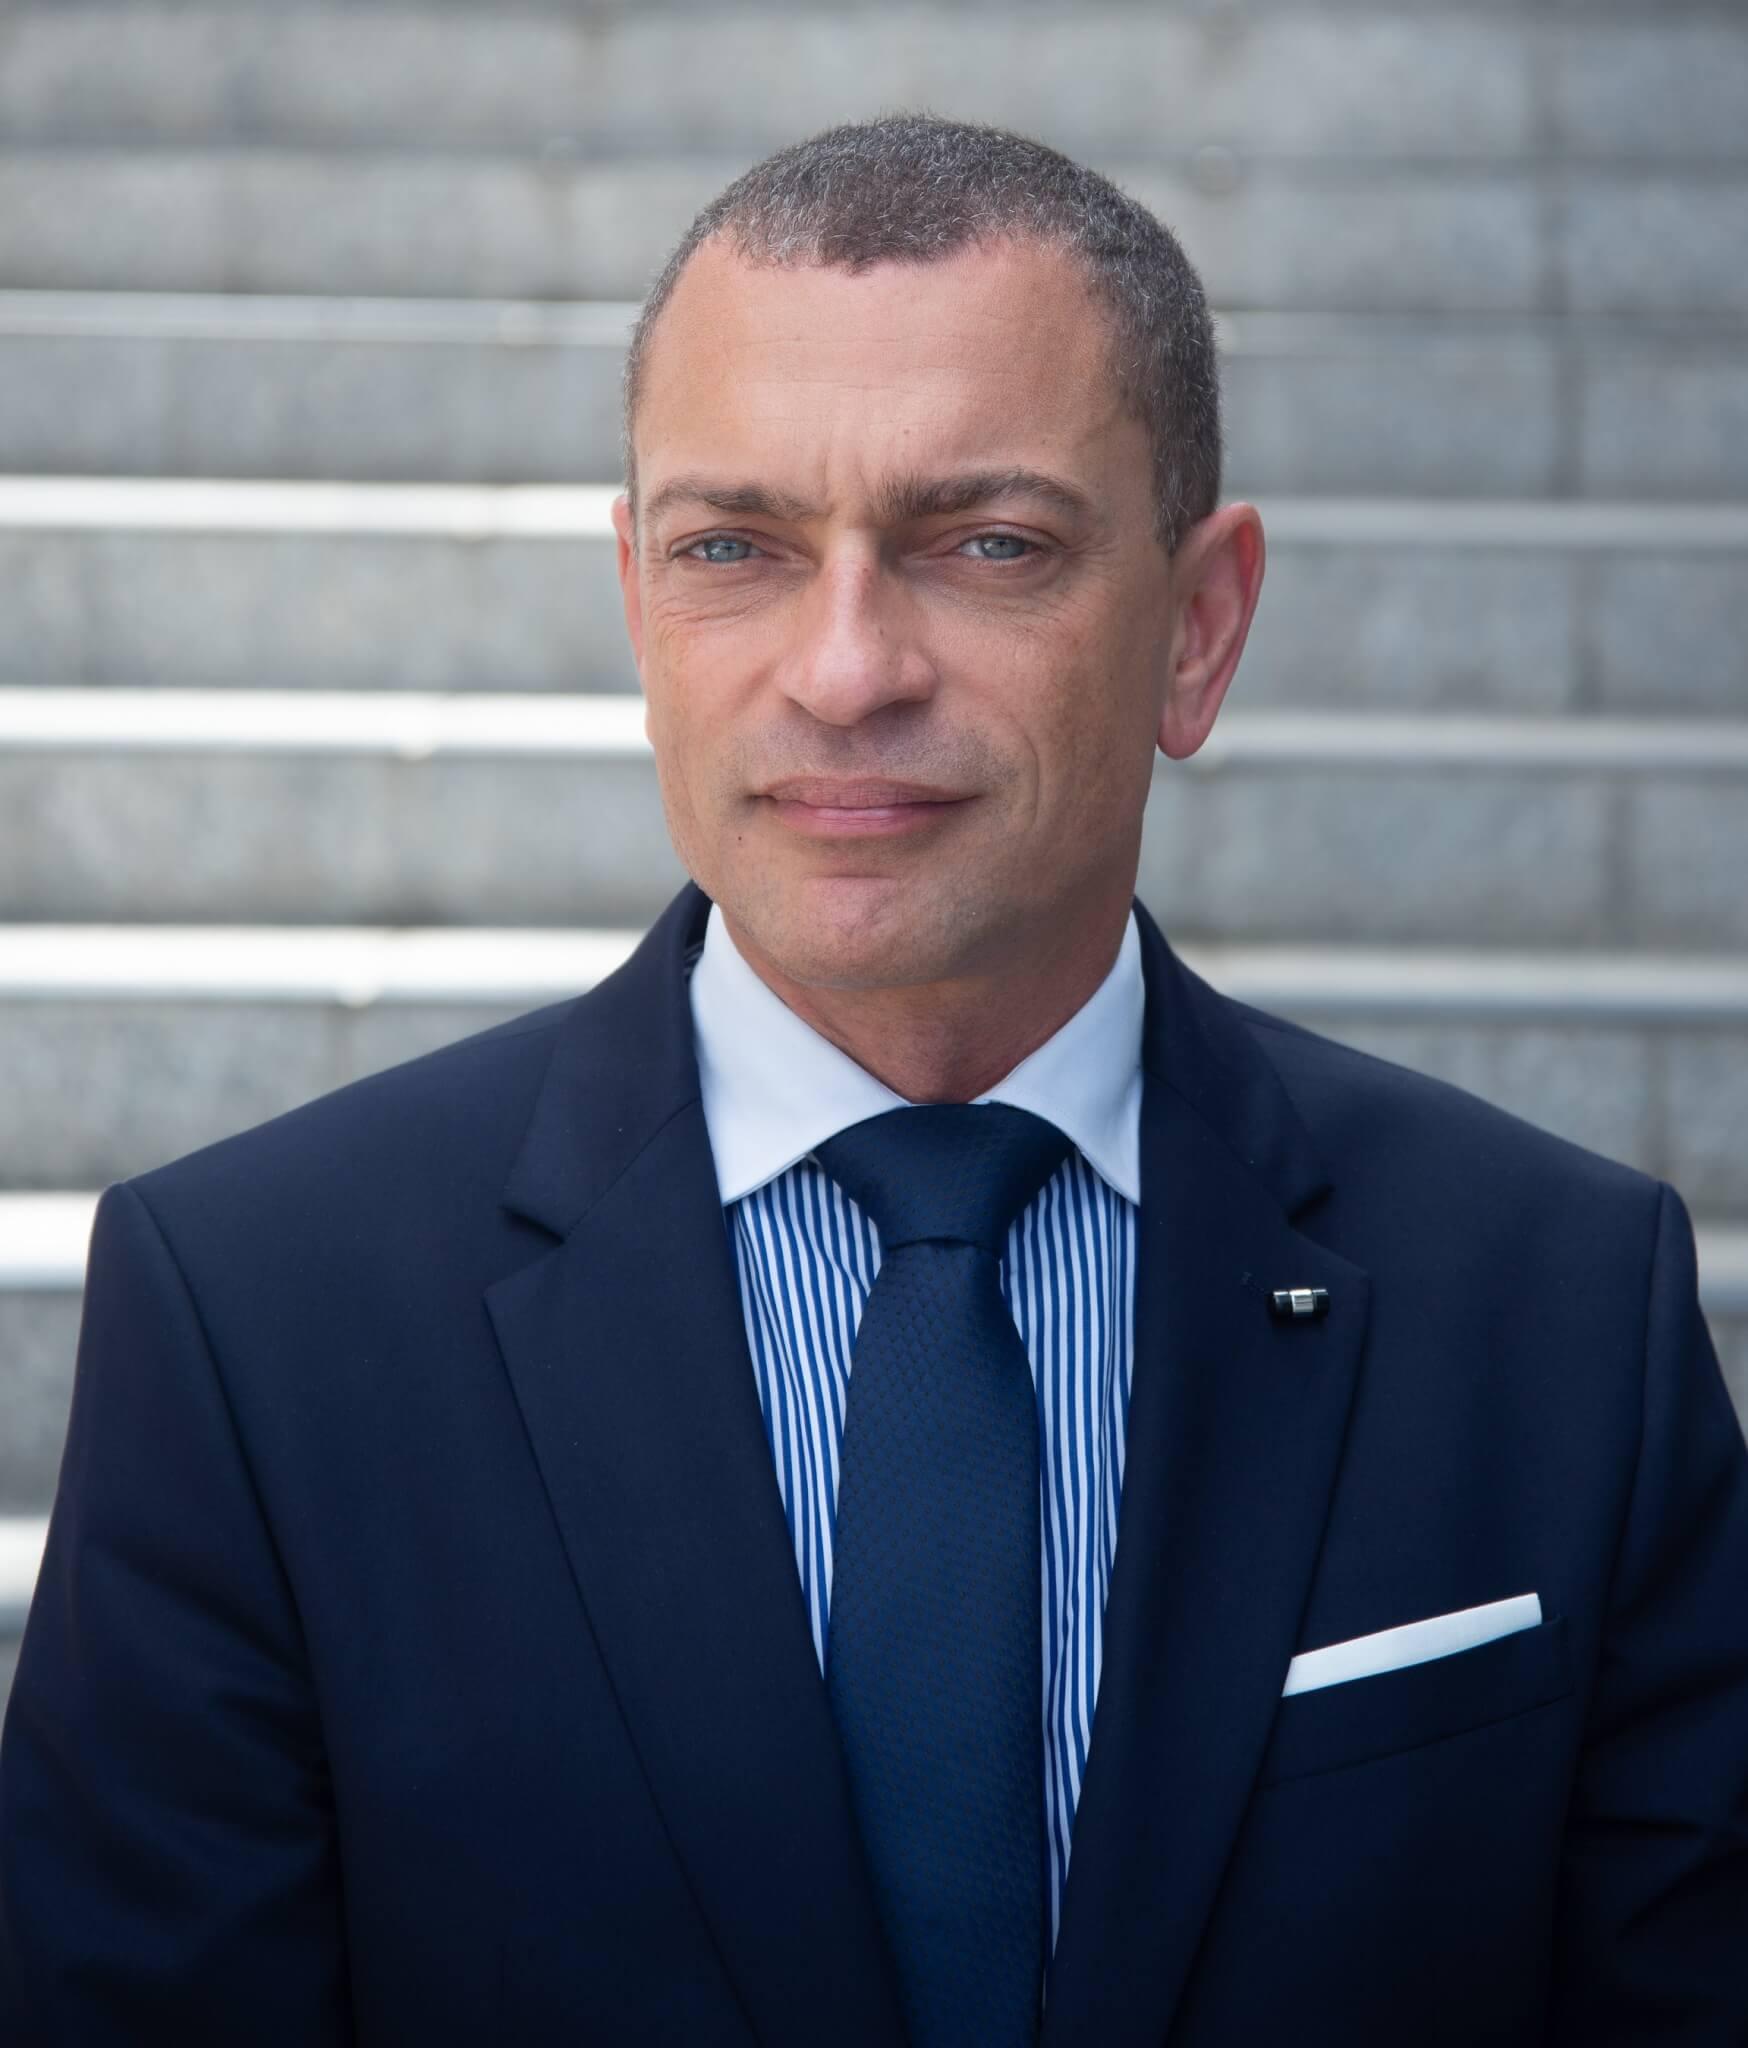 Martinique Tourism Authority announces new CEO